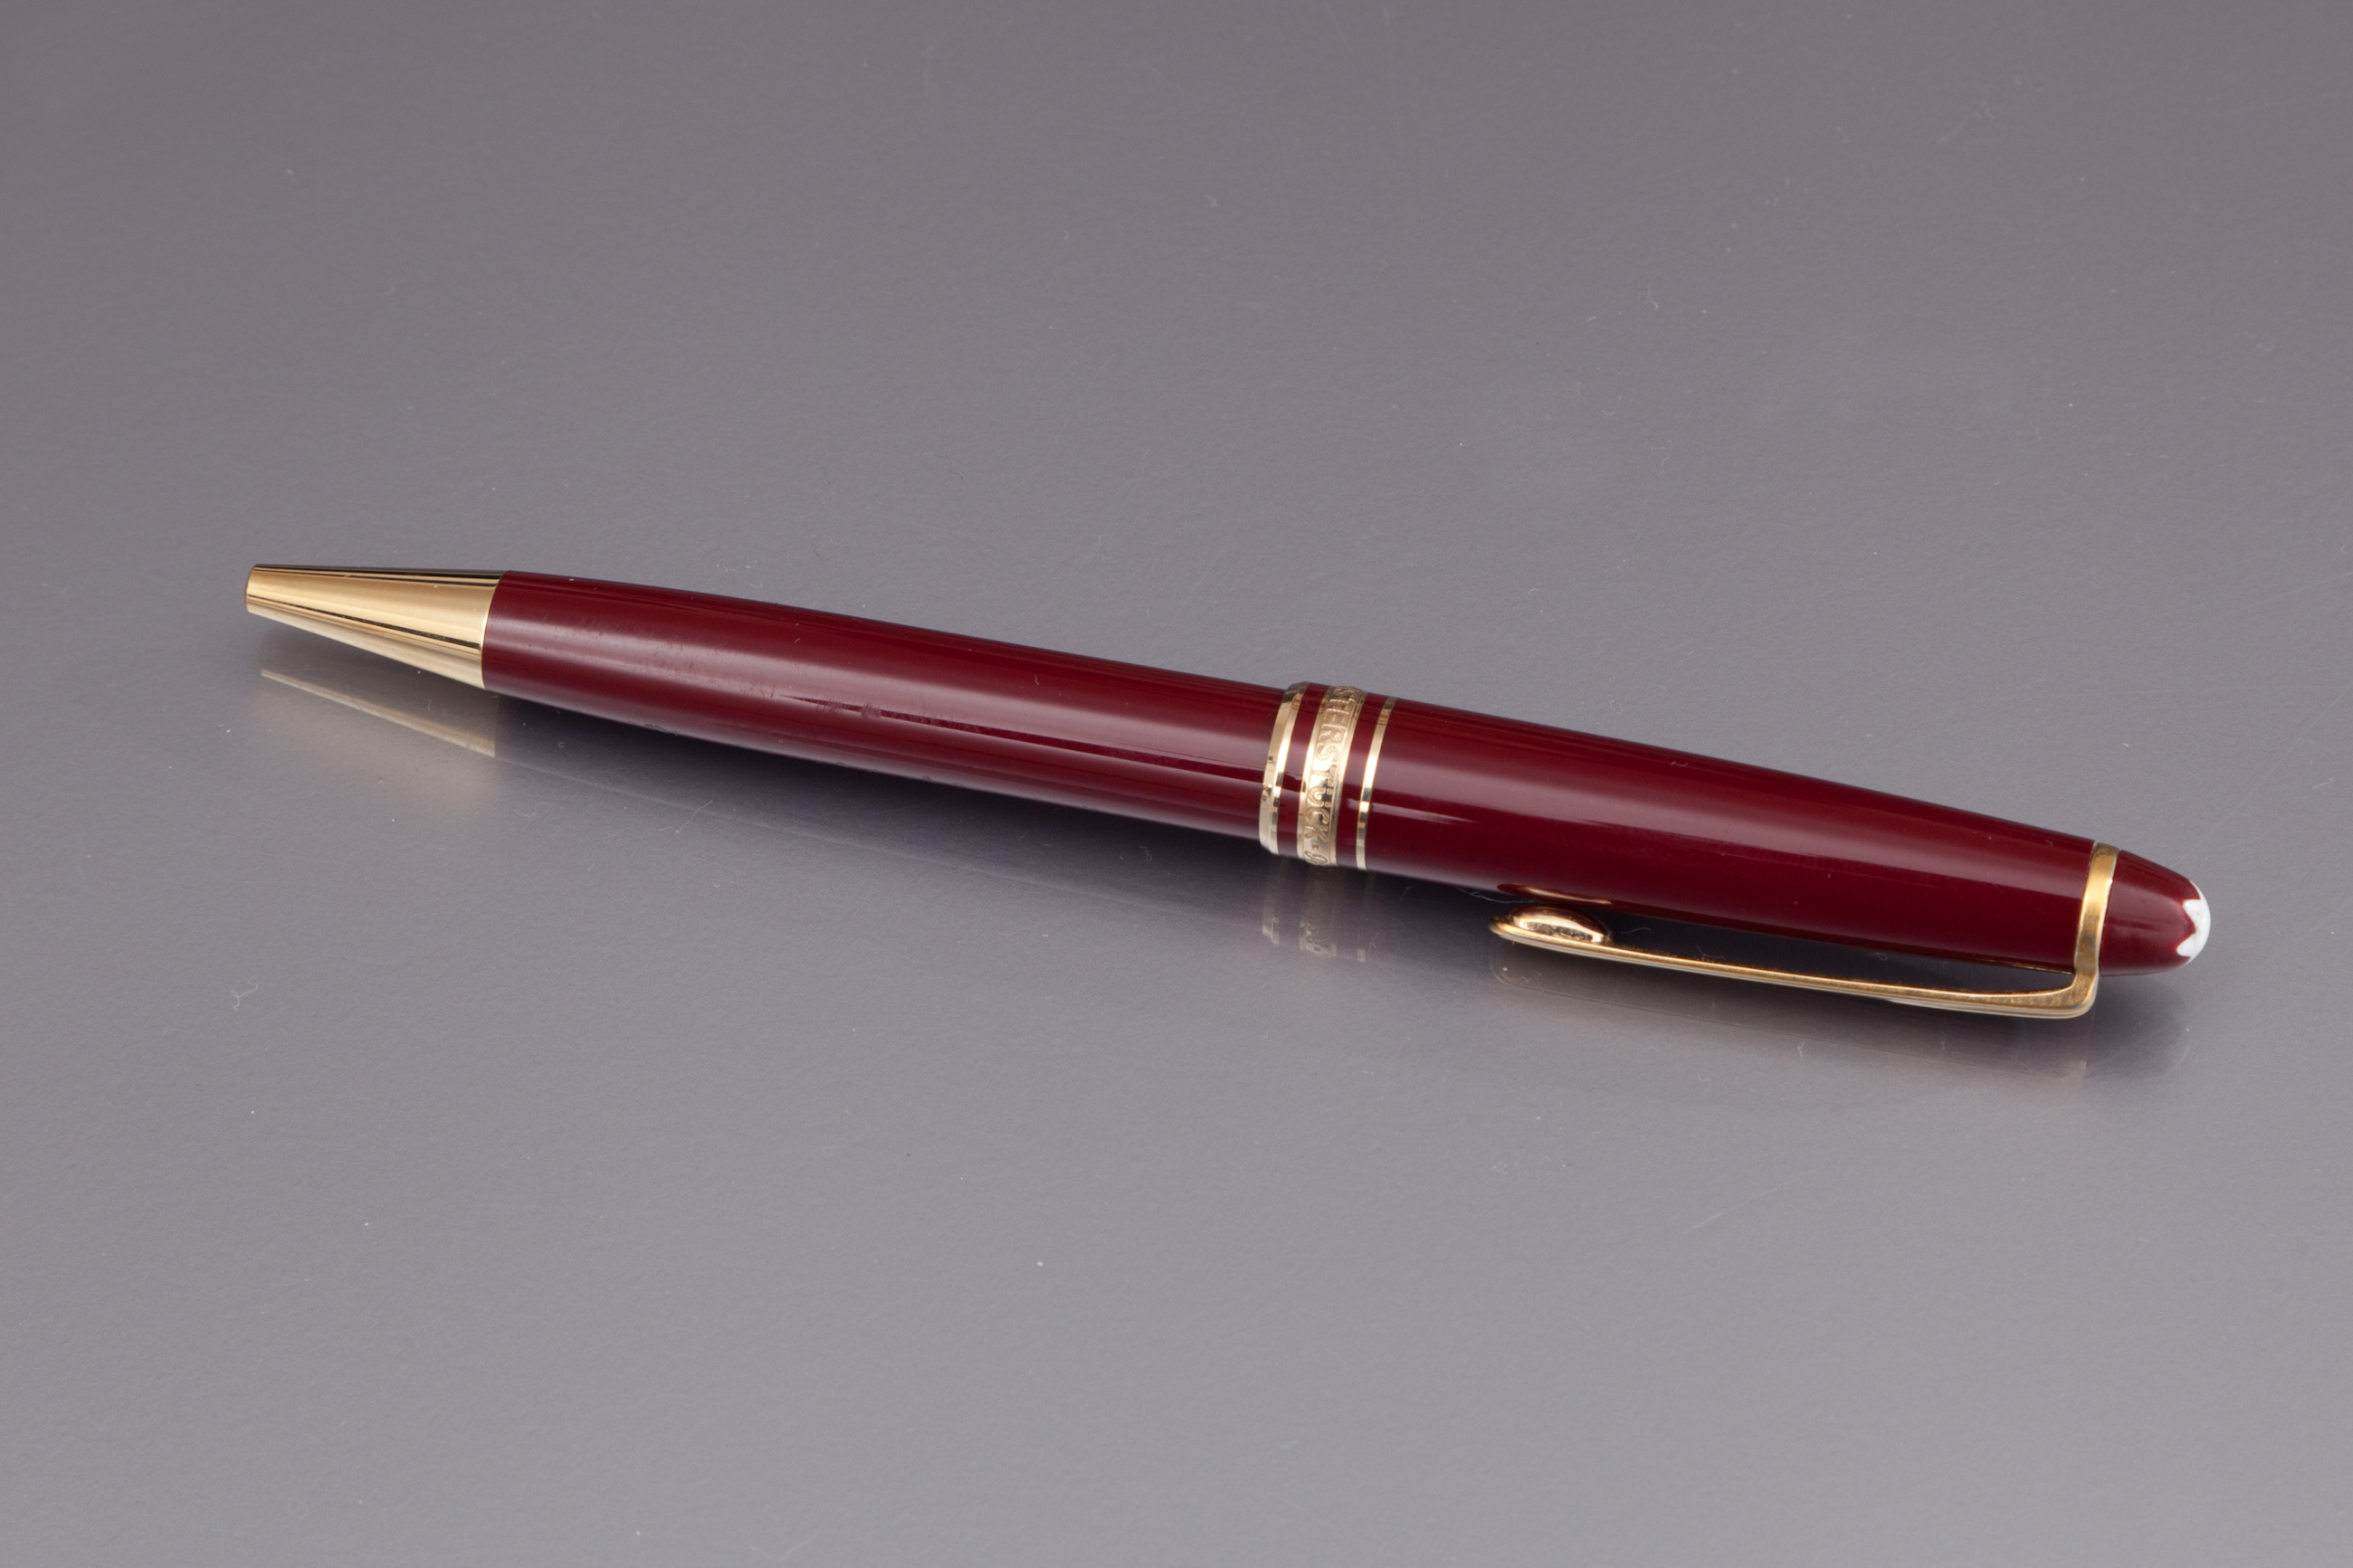 stylo bille mont blanc meisterstuck pix